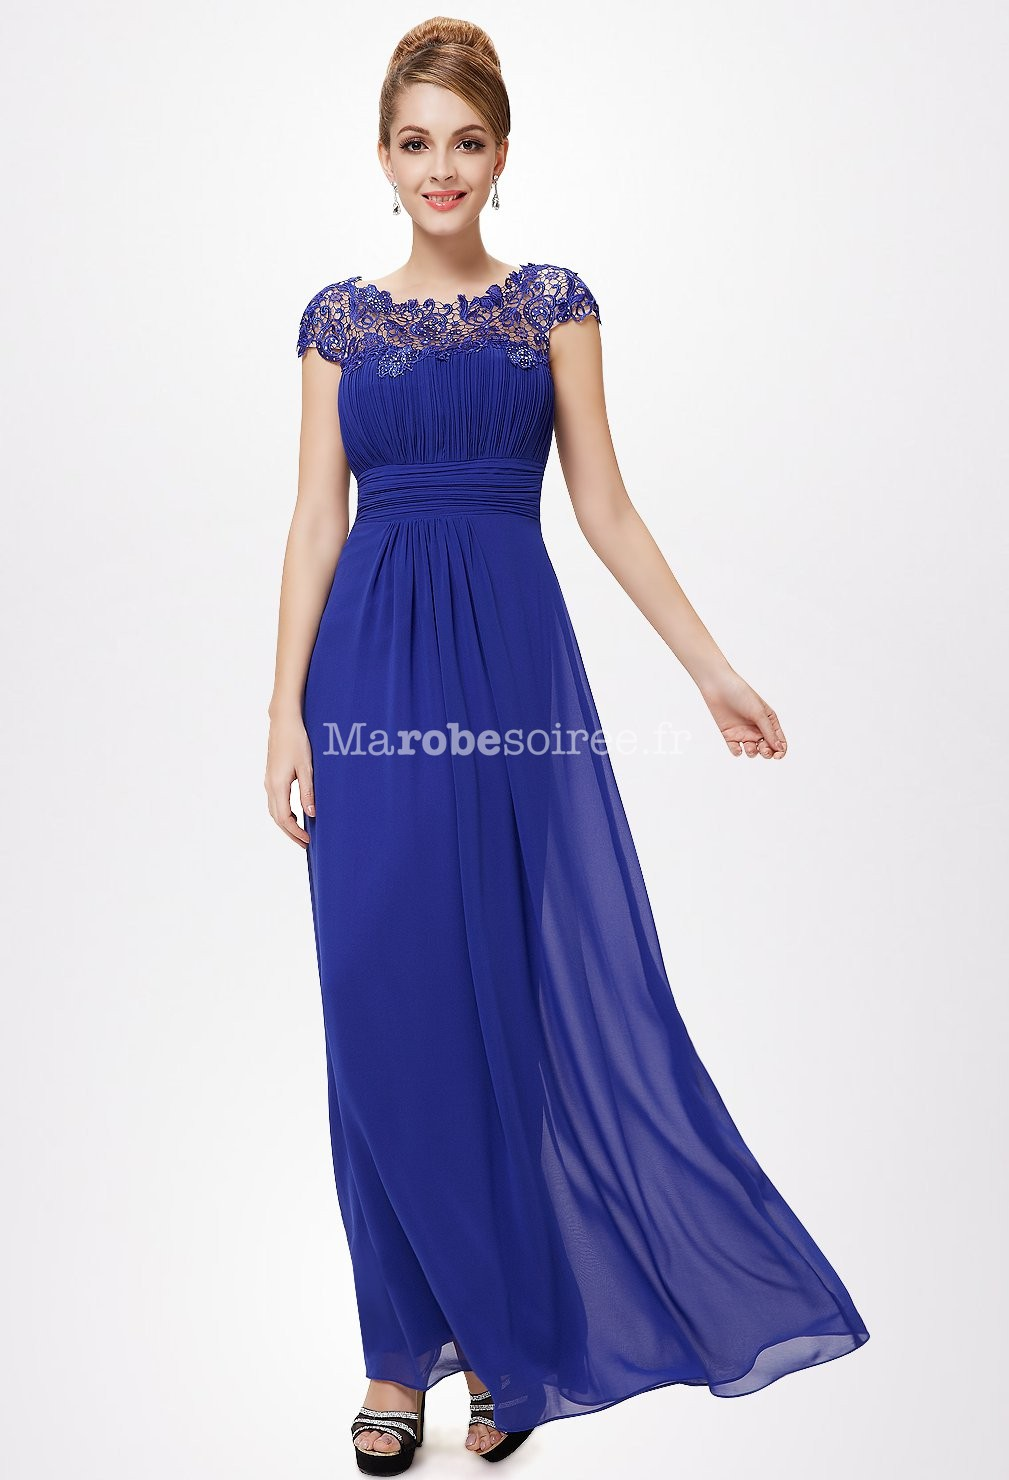 royal blue dress - 617×1280